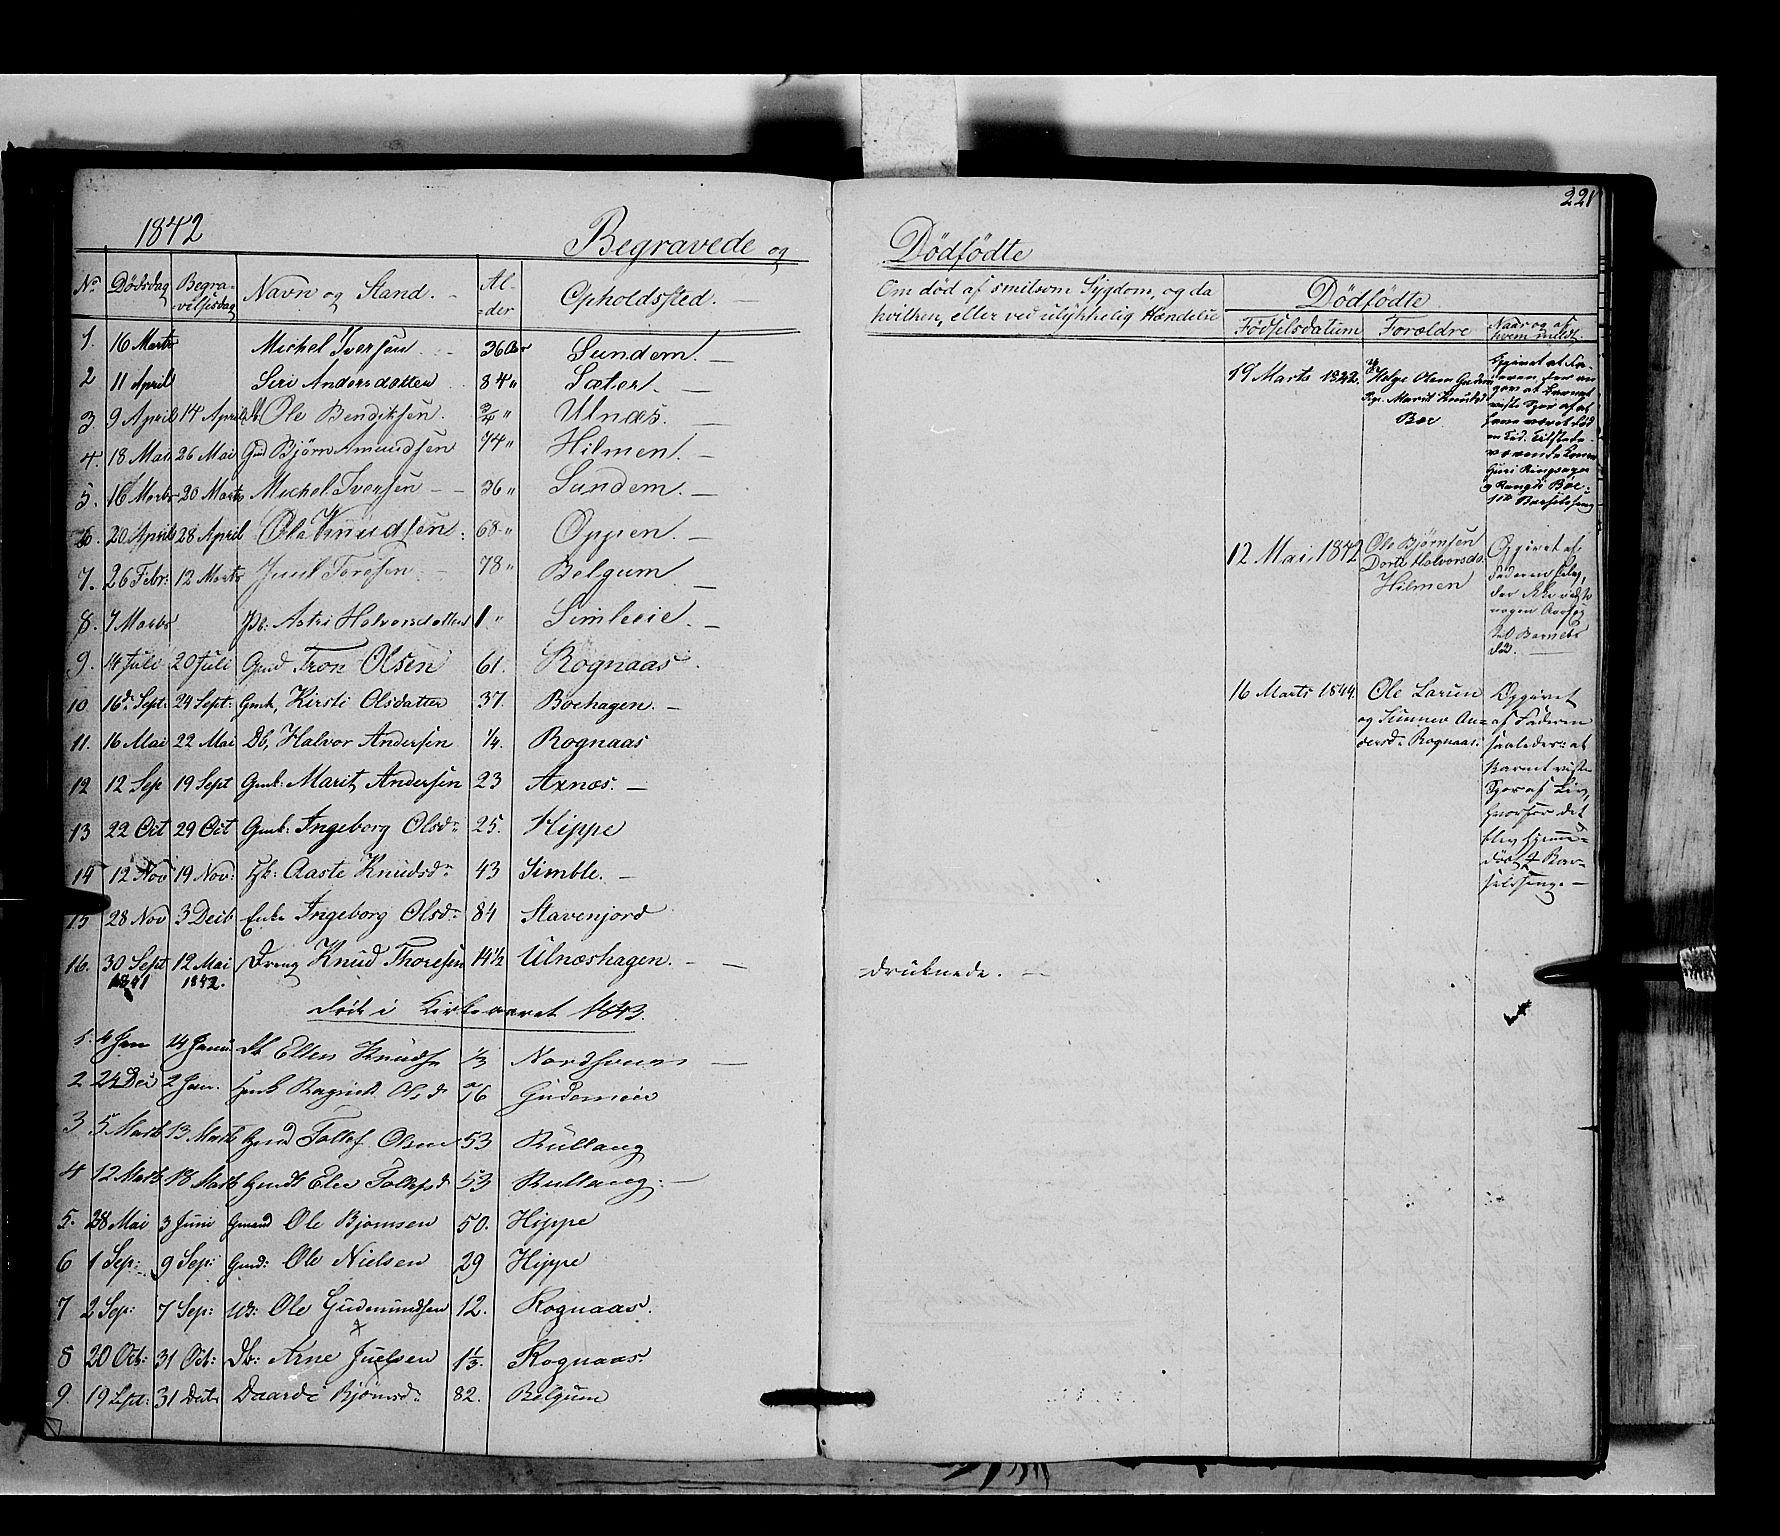 SAH, Nord-Aurdal prestekontor, Ministerialbok nr. 6, 1842-1863, s. 221